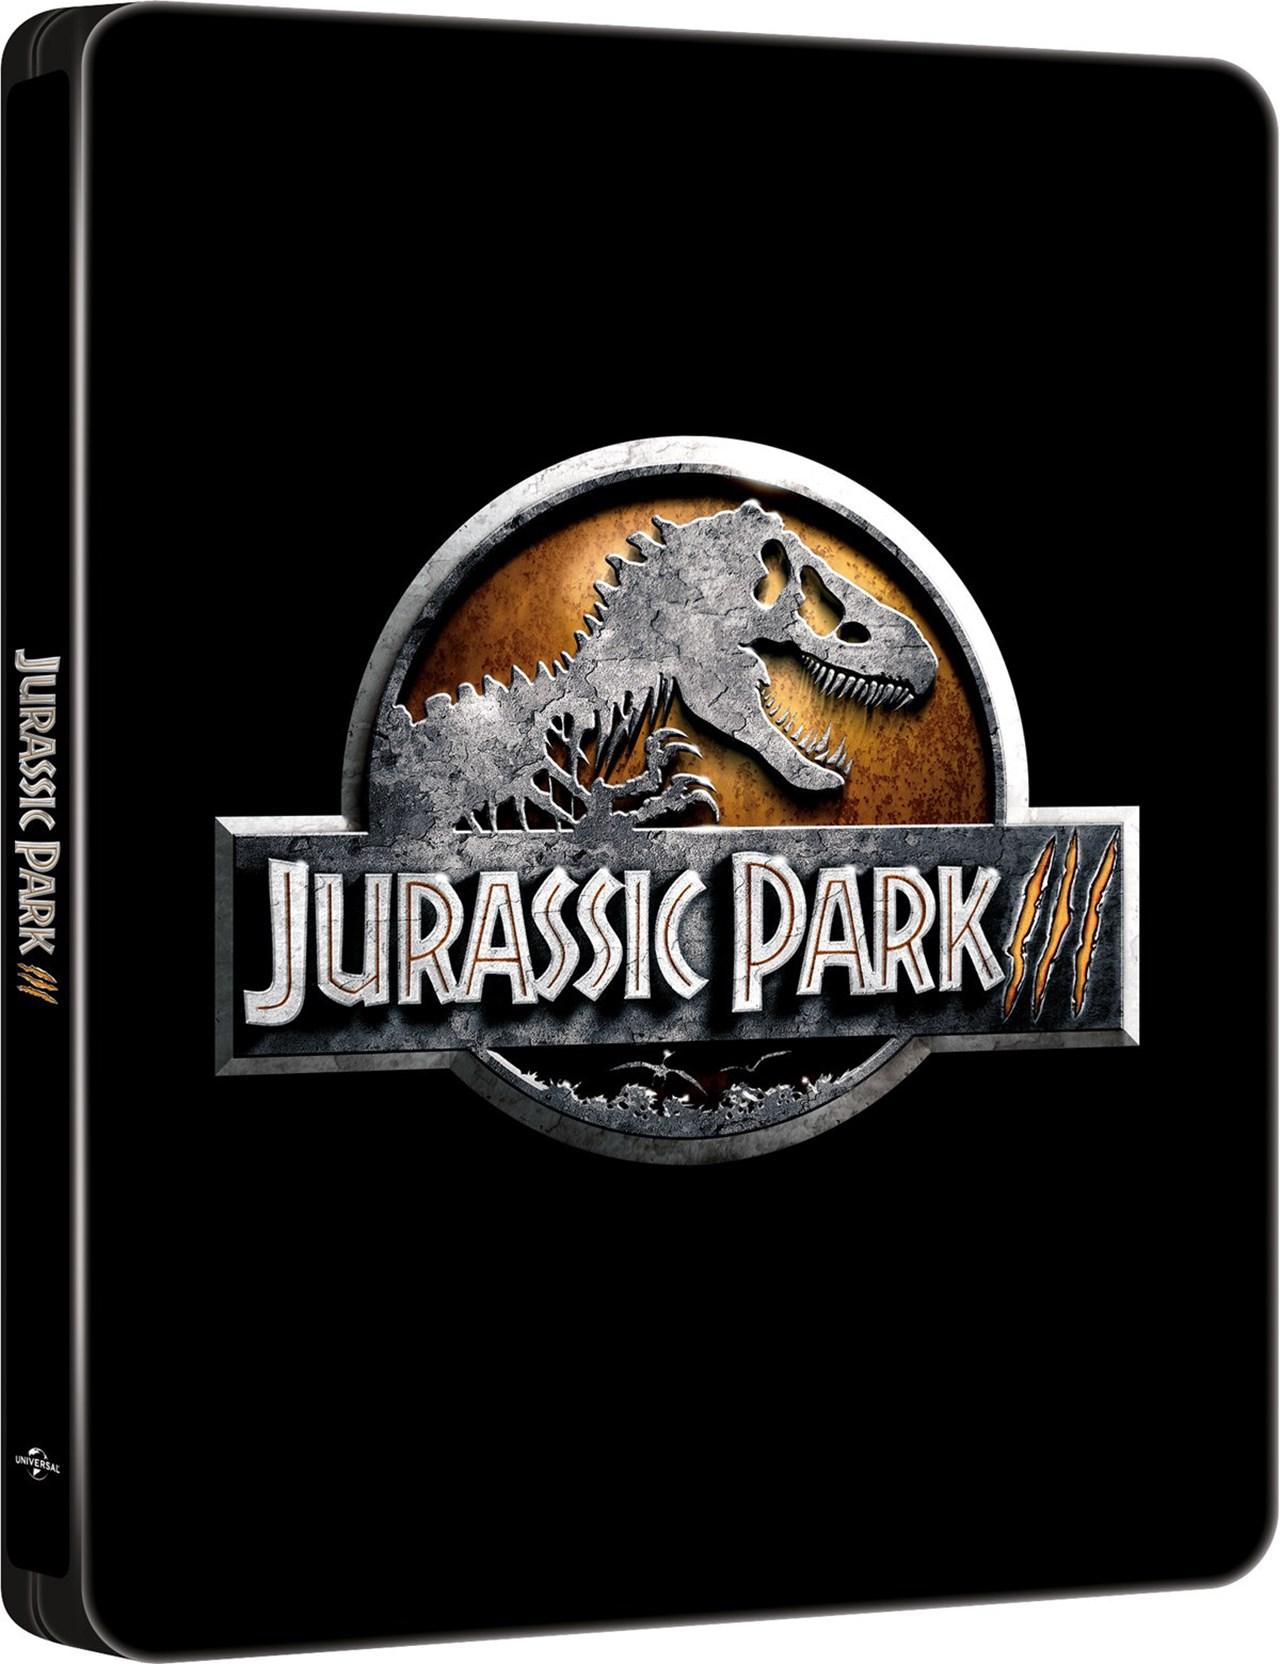 Jurassic Park 3 (hmv Exclusive) - 1